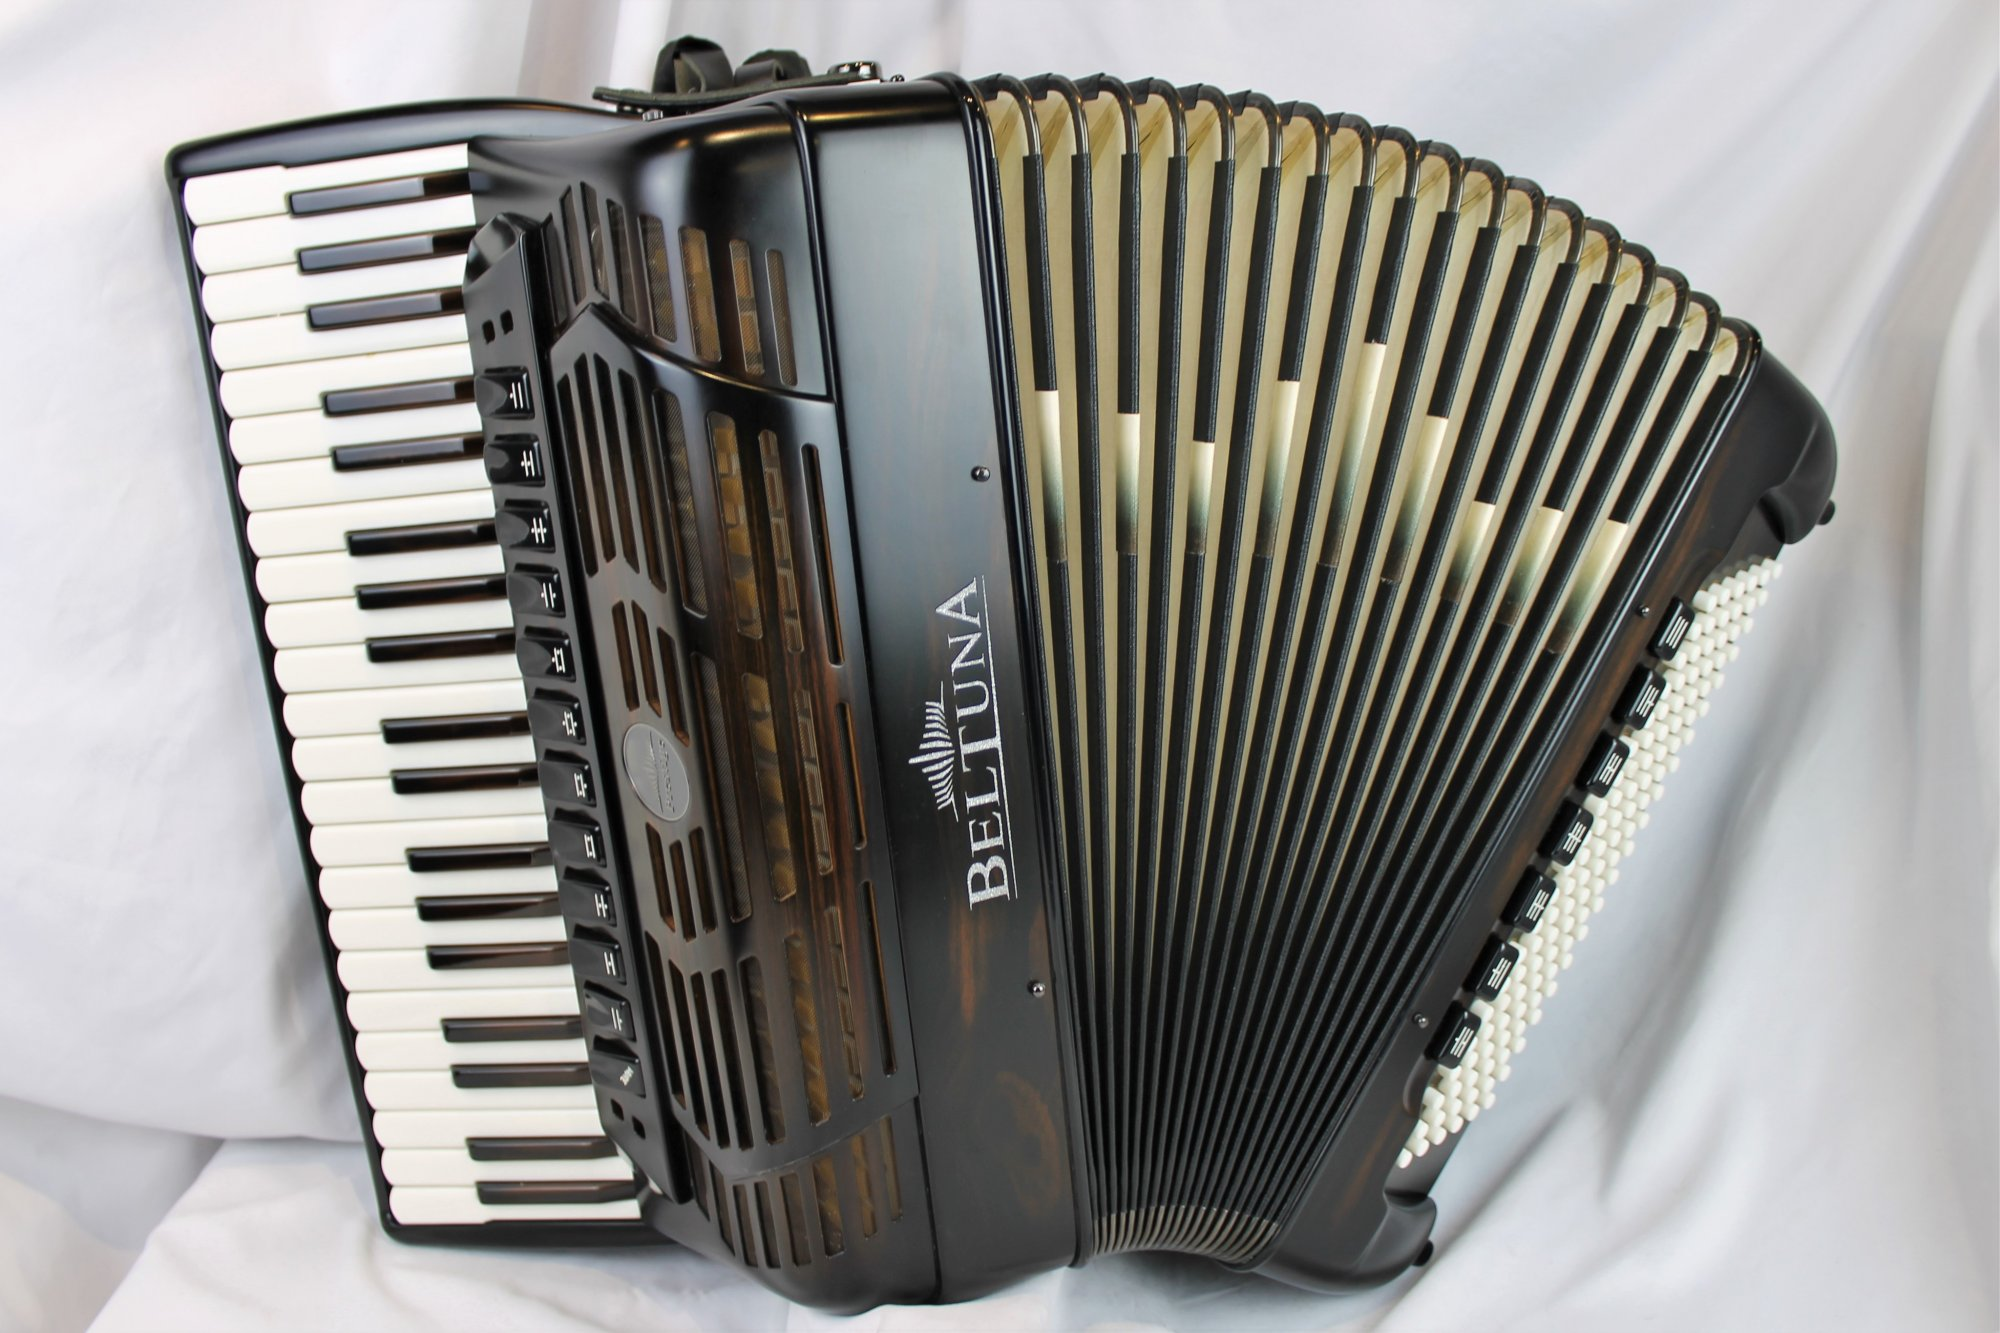 NEW Ebony Beltuna Prestige IV Slender Piano Accordion LMMH 41 120